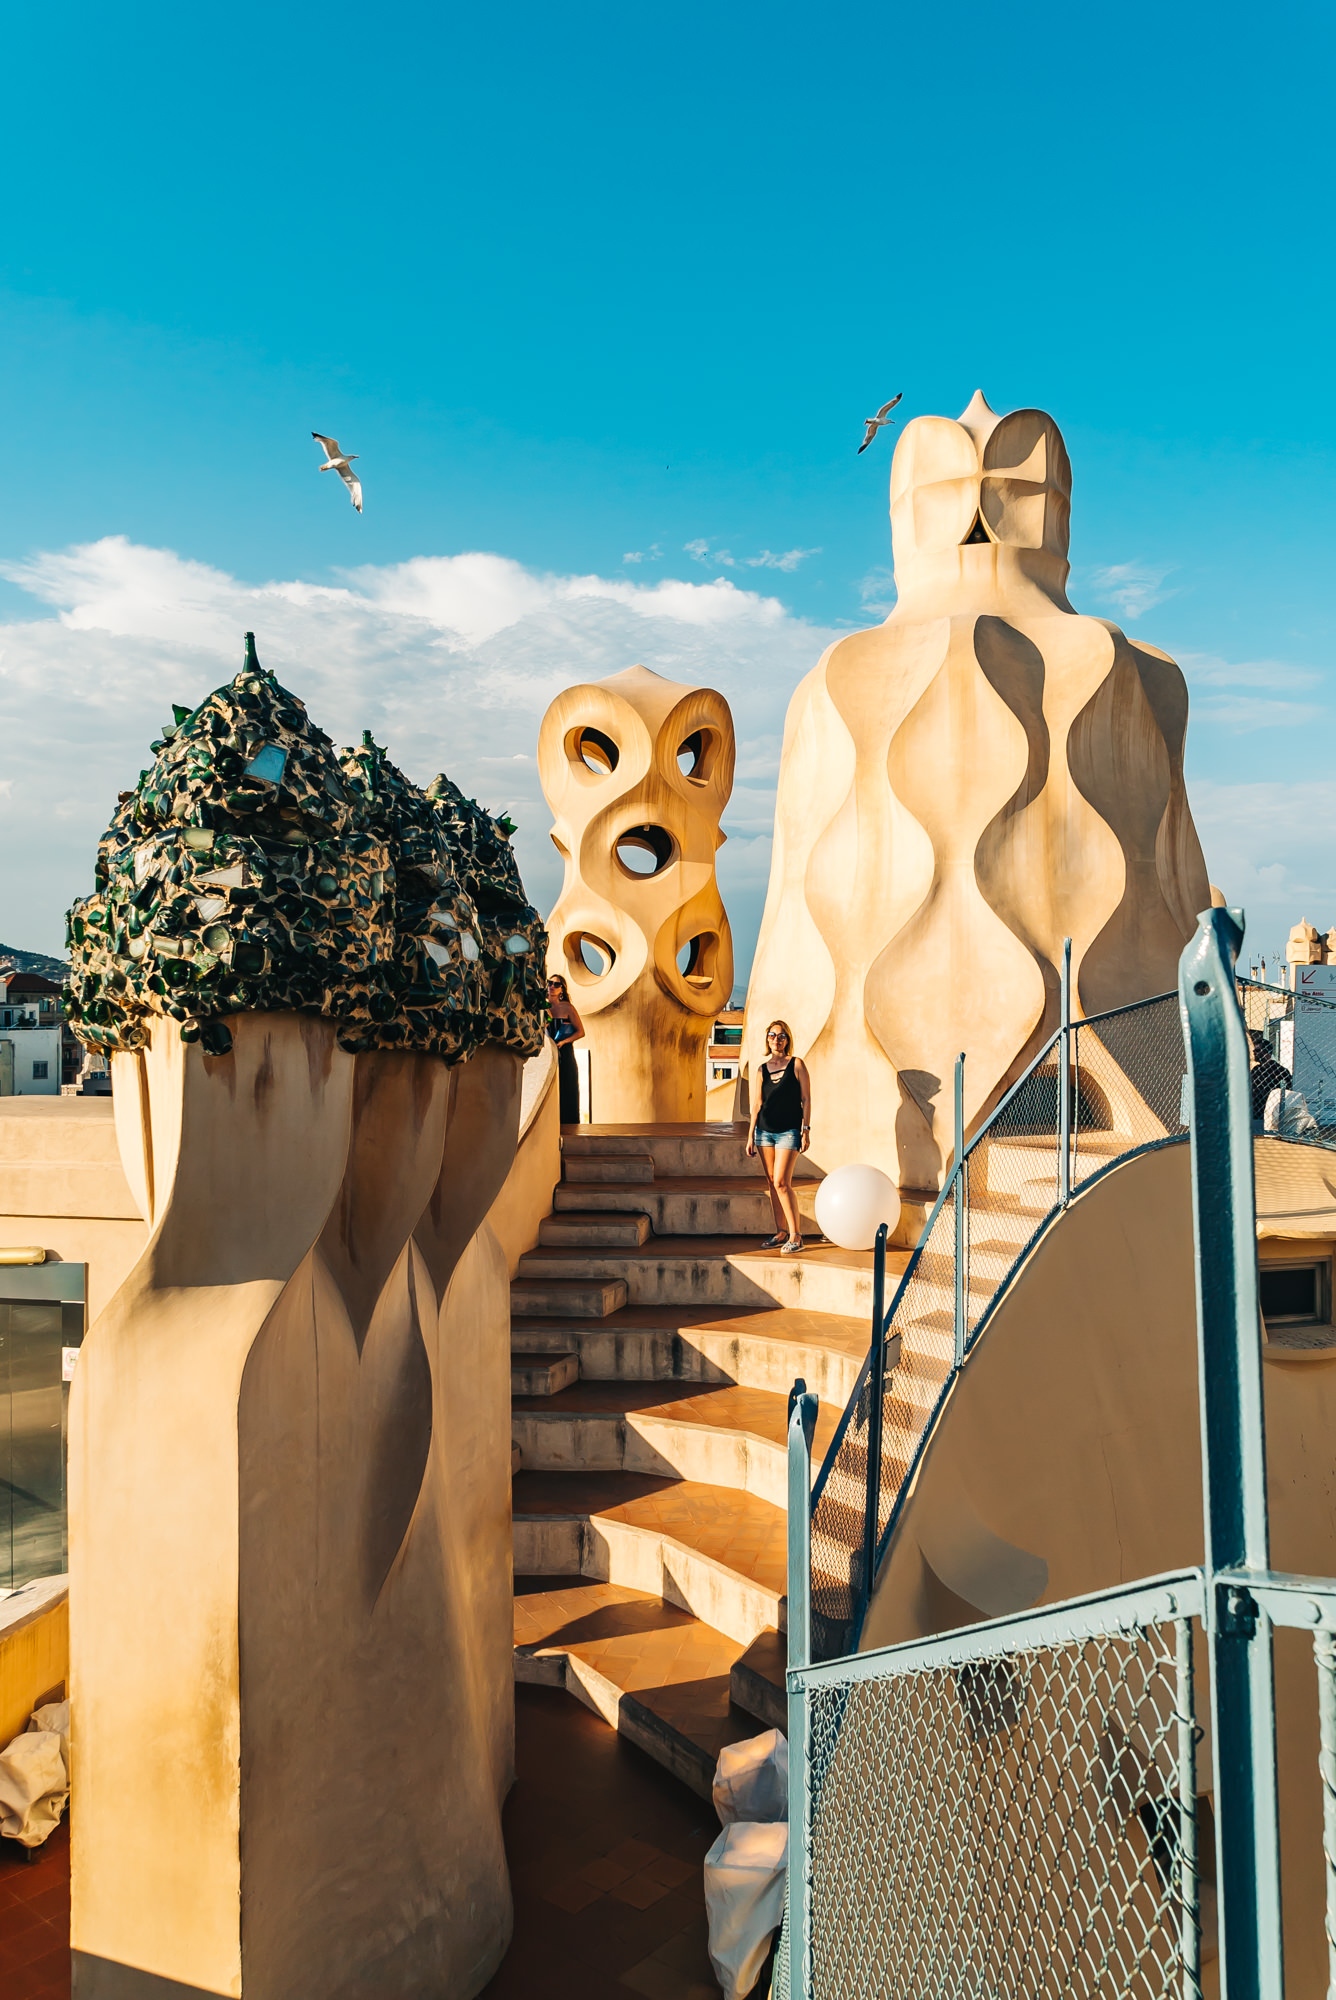 Antoni Gaudi's sculptures on the rooftop of Casa Mila